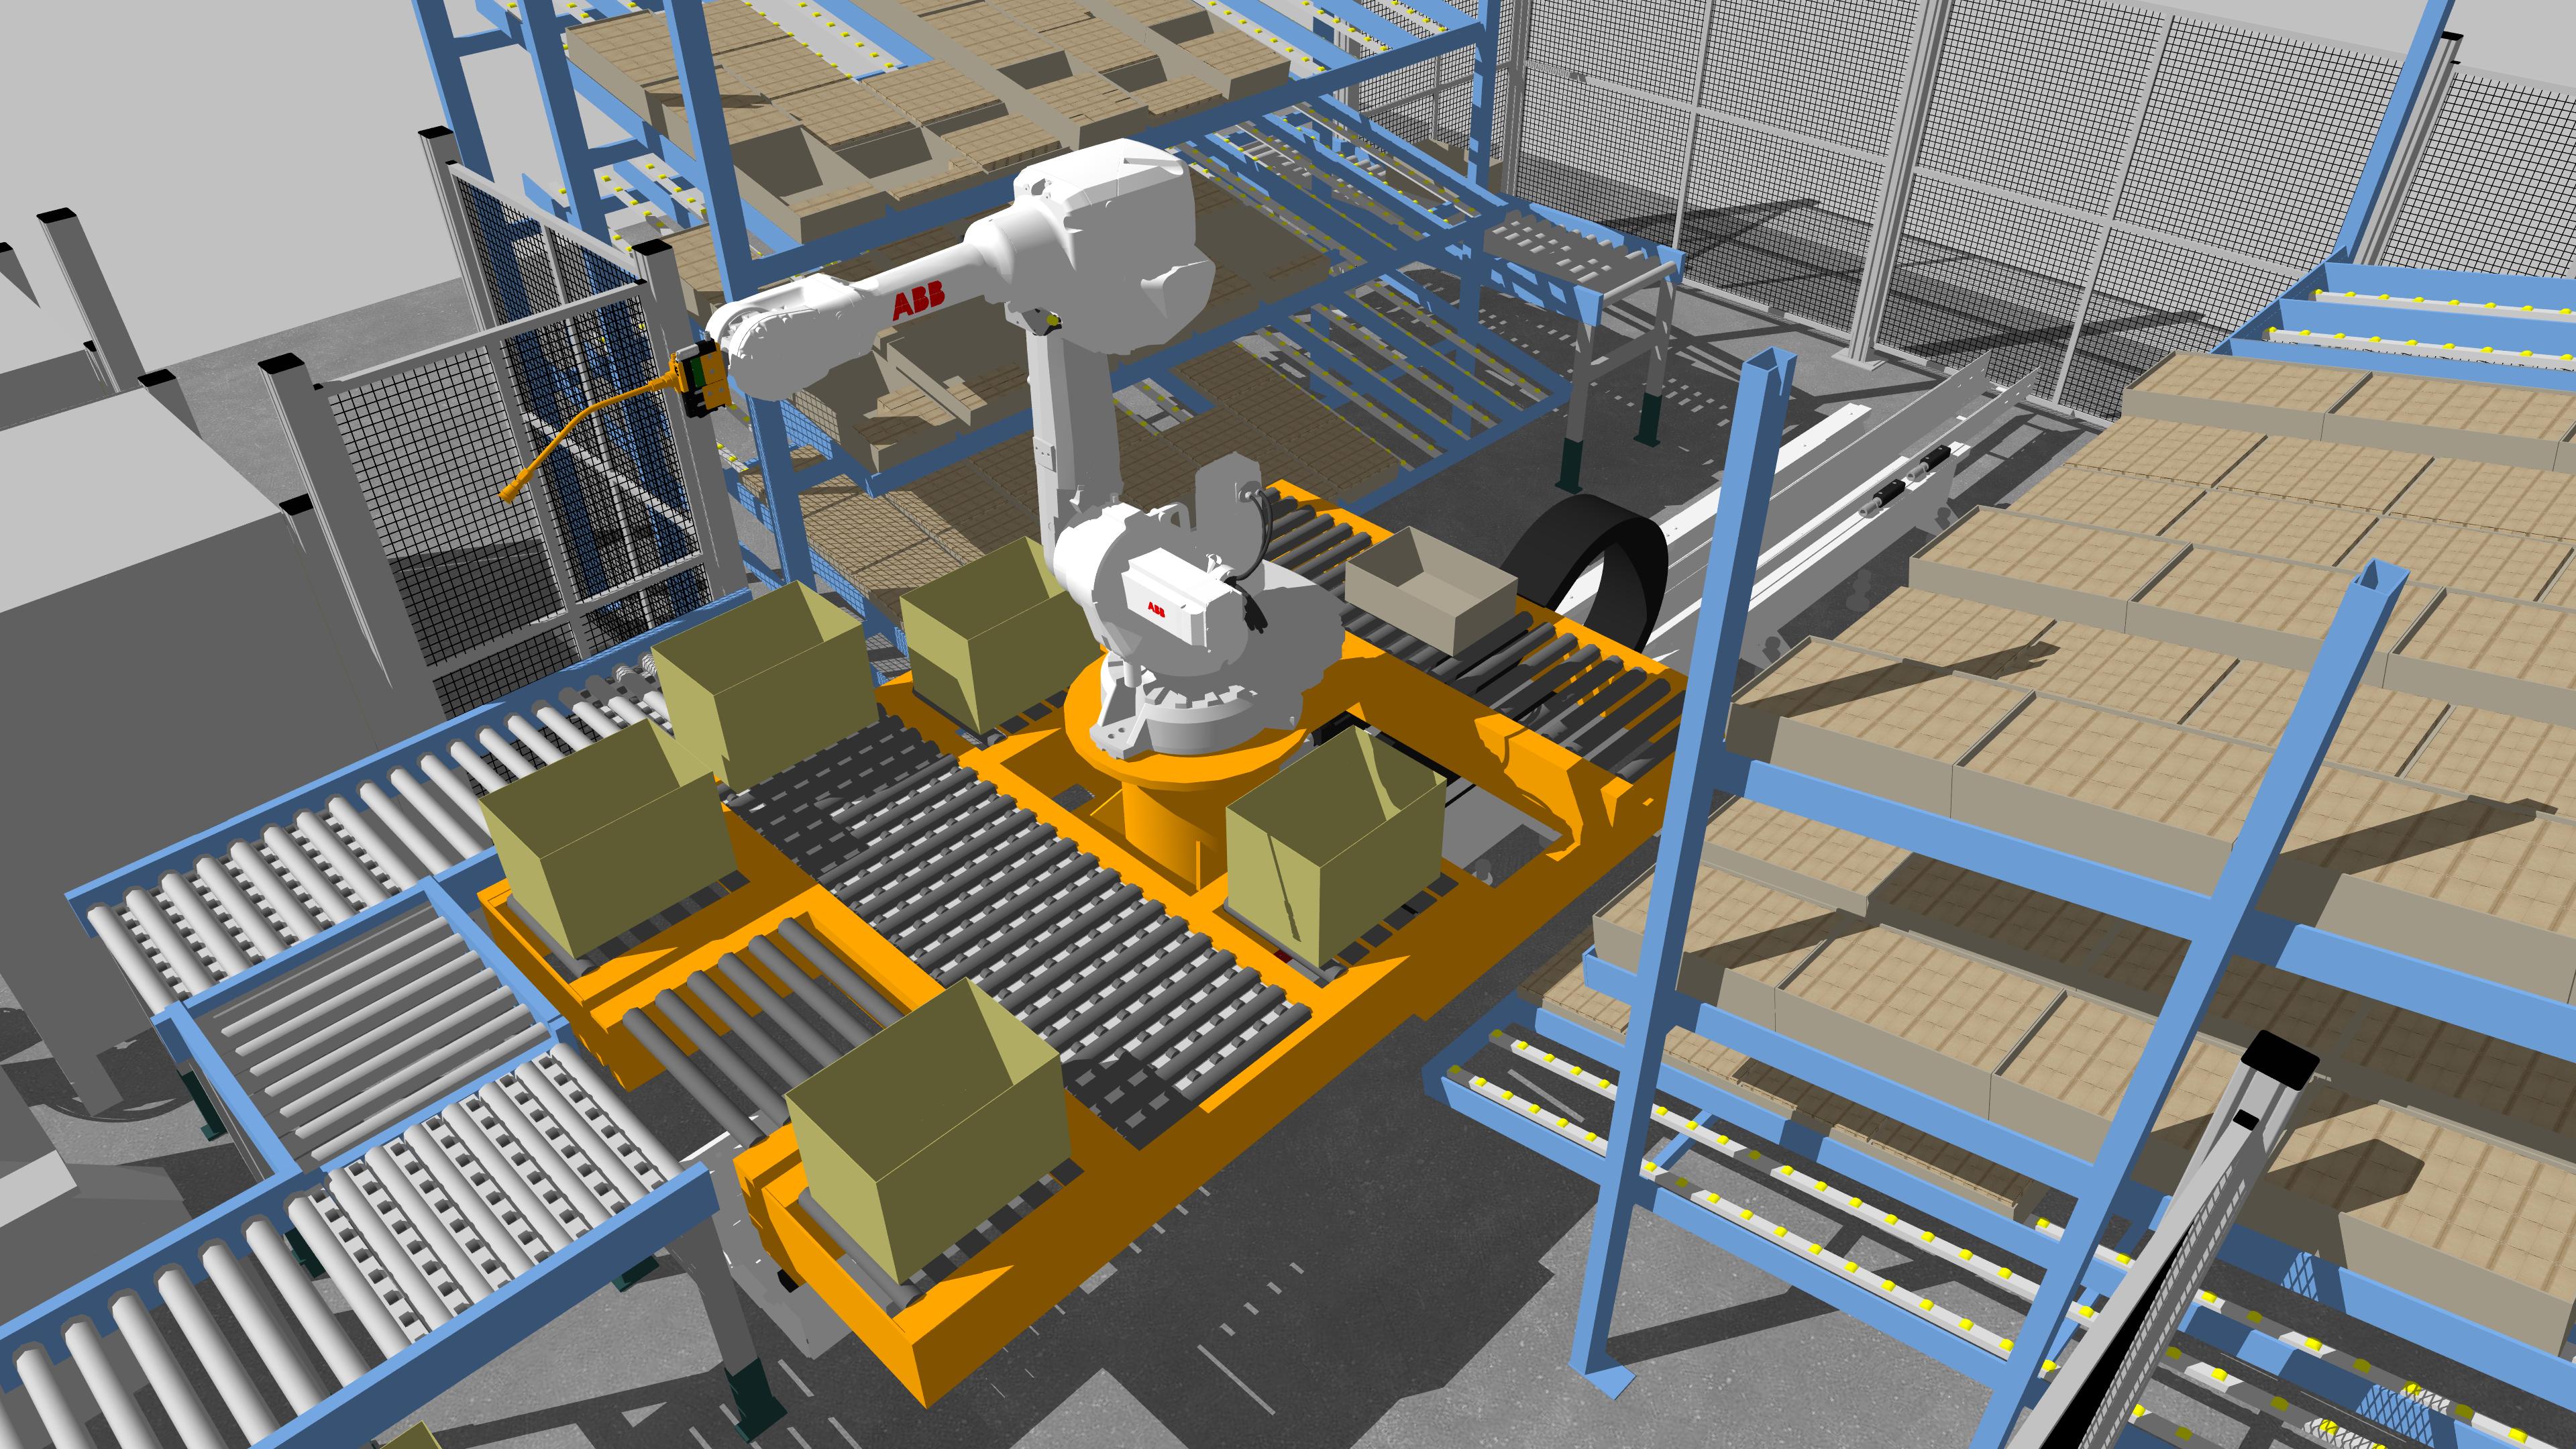 Carter Intralogistics Robotic Product Picking